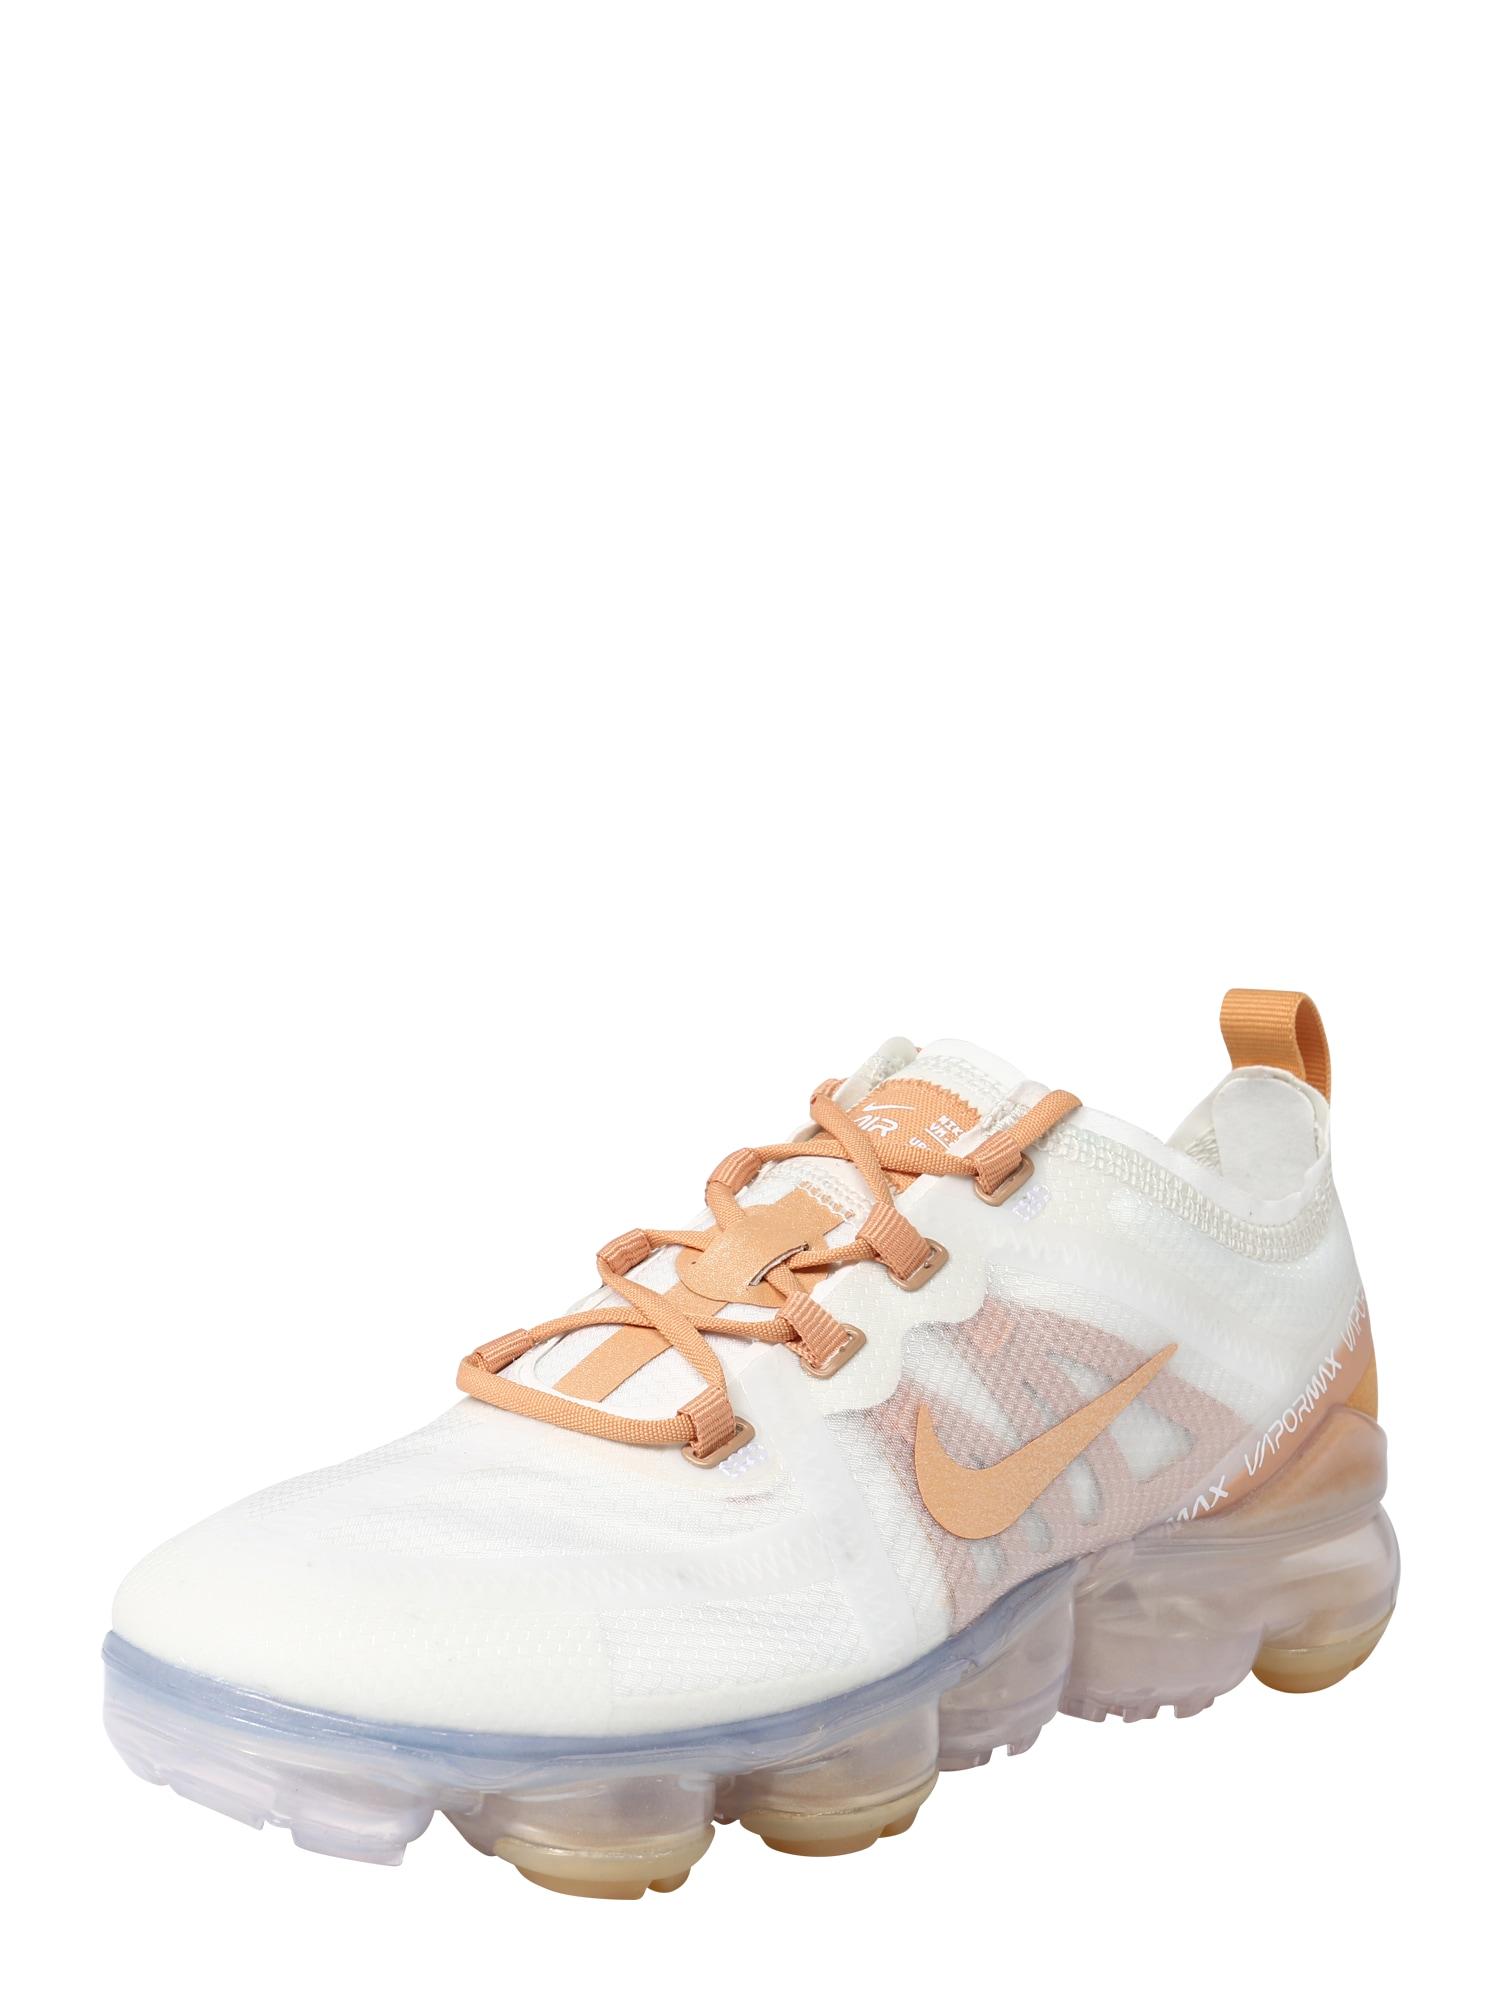 Tenisky AIR VAPORMAX růžová bílá Nike Sportswear